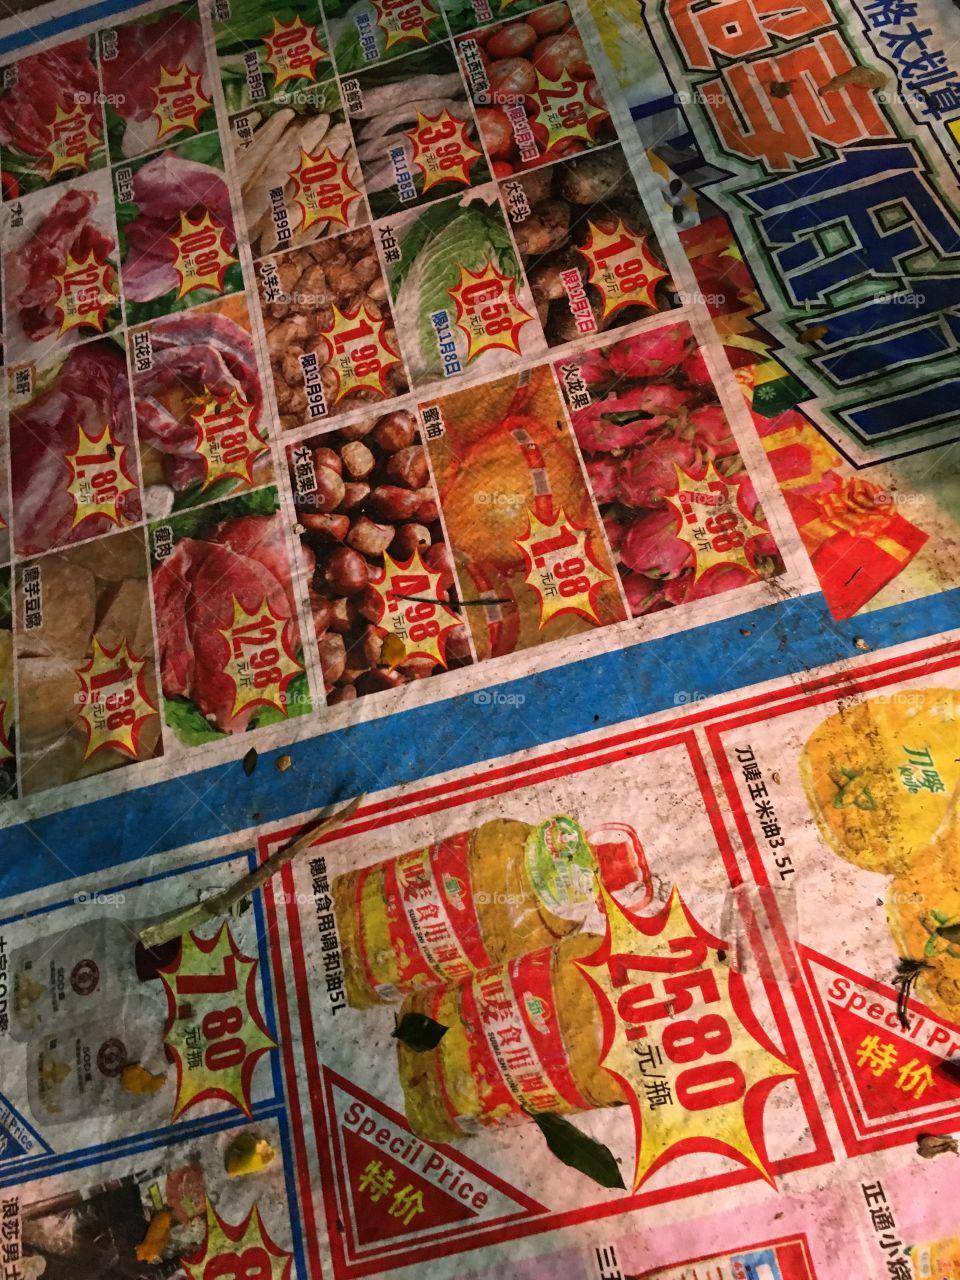 Chinese Food Advertising on Floor - Shenzhen, China